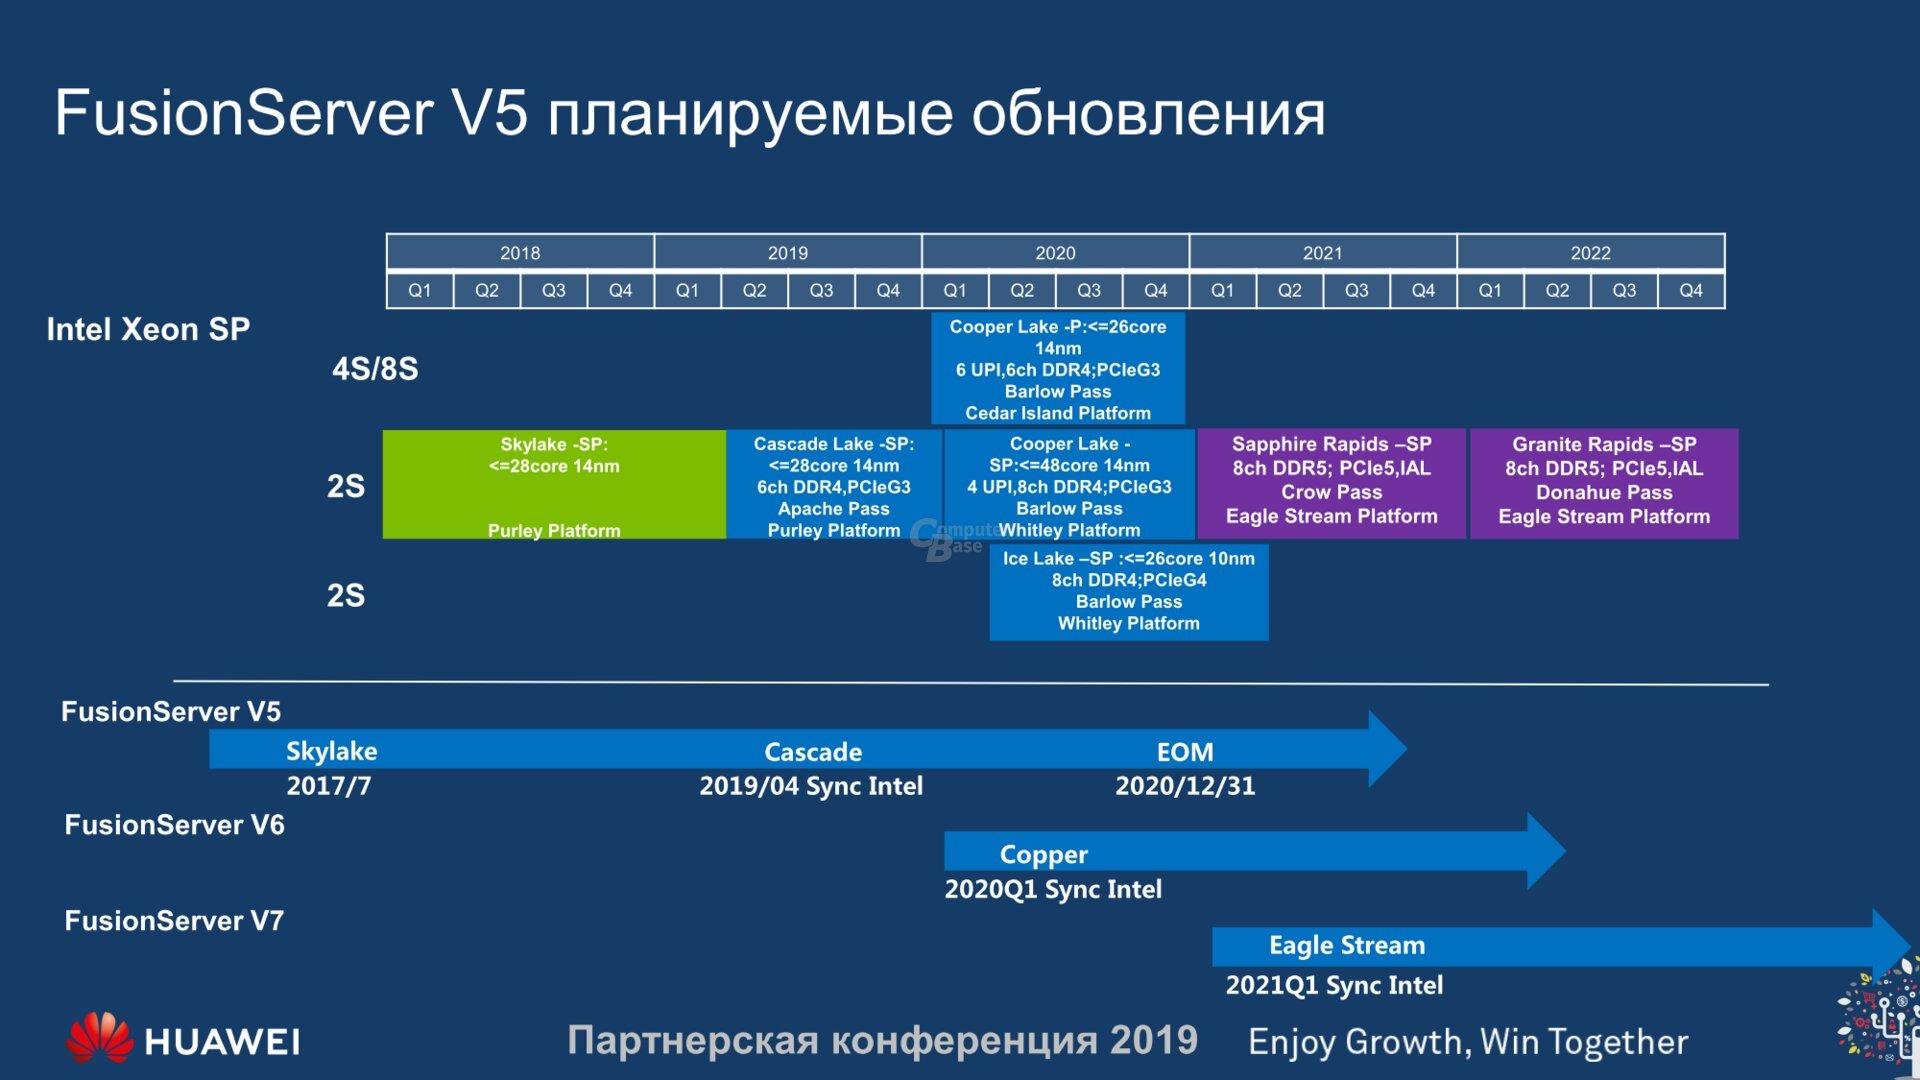 Huwaei Leak Intel Roadmap Cooper Lake Sapphire Rapid DDR5 PCIe 5.0